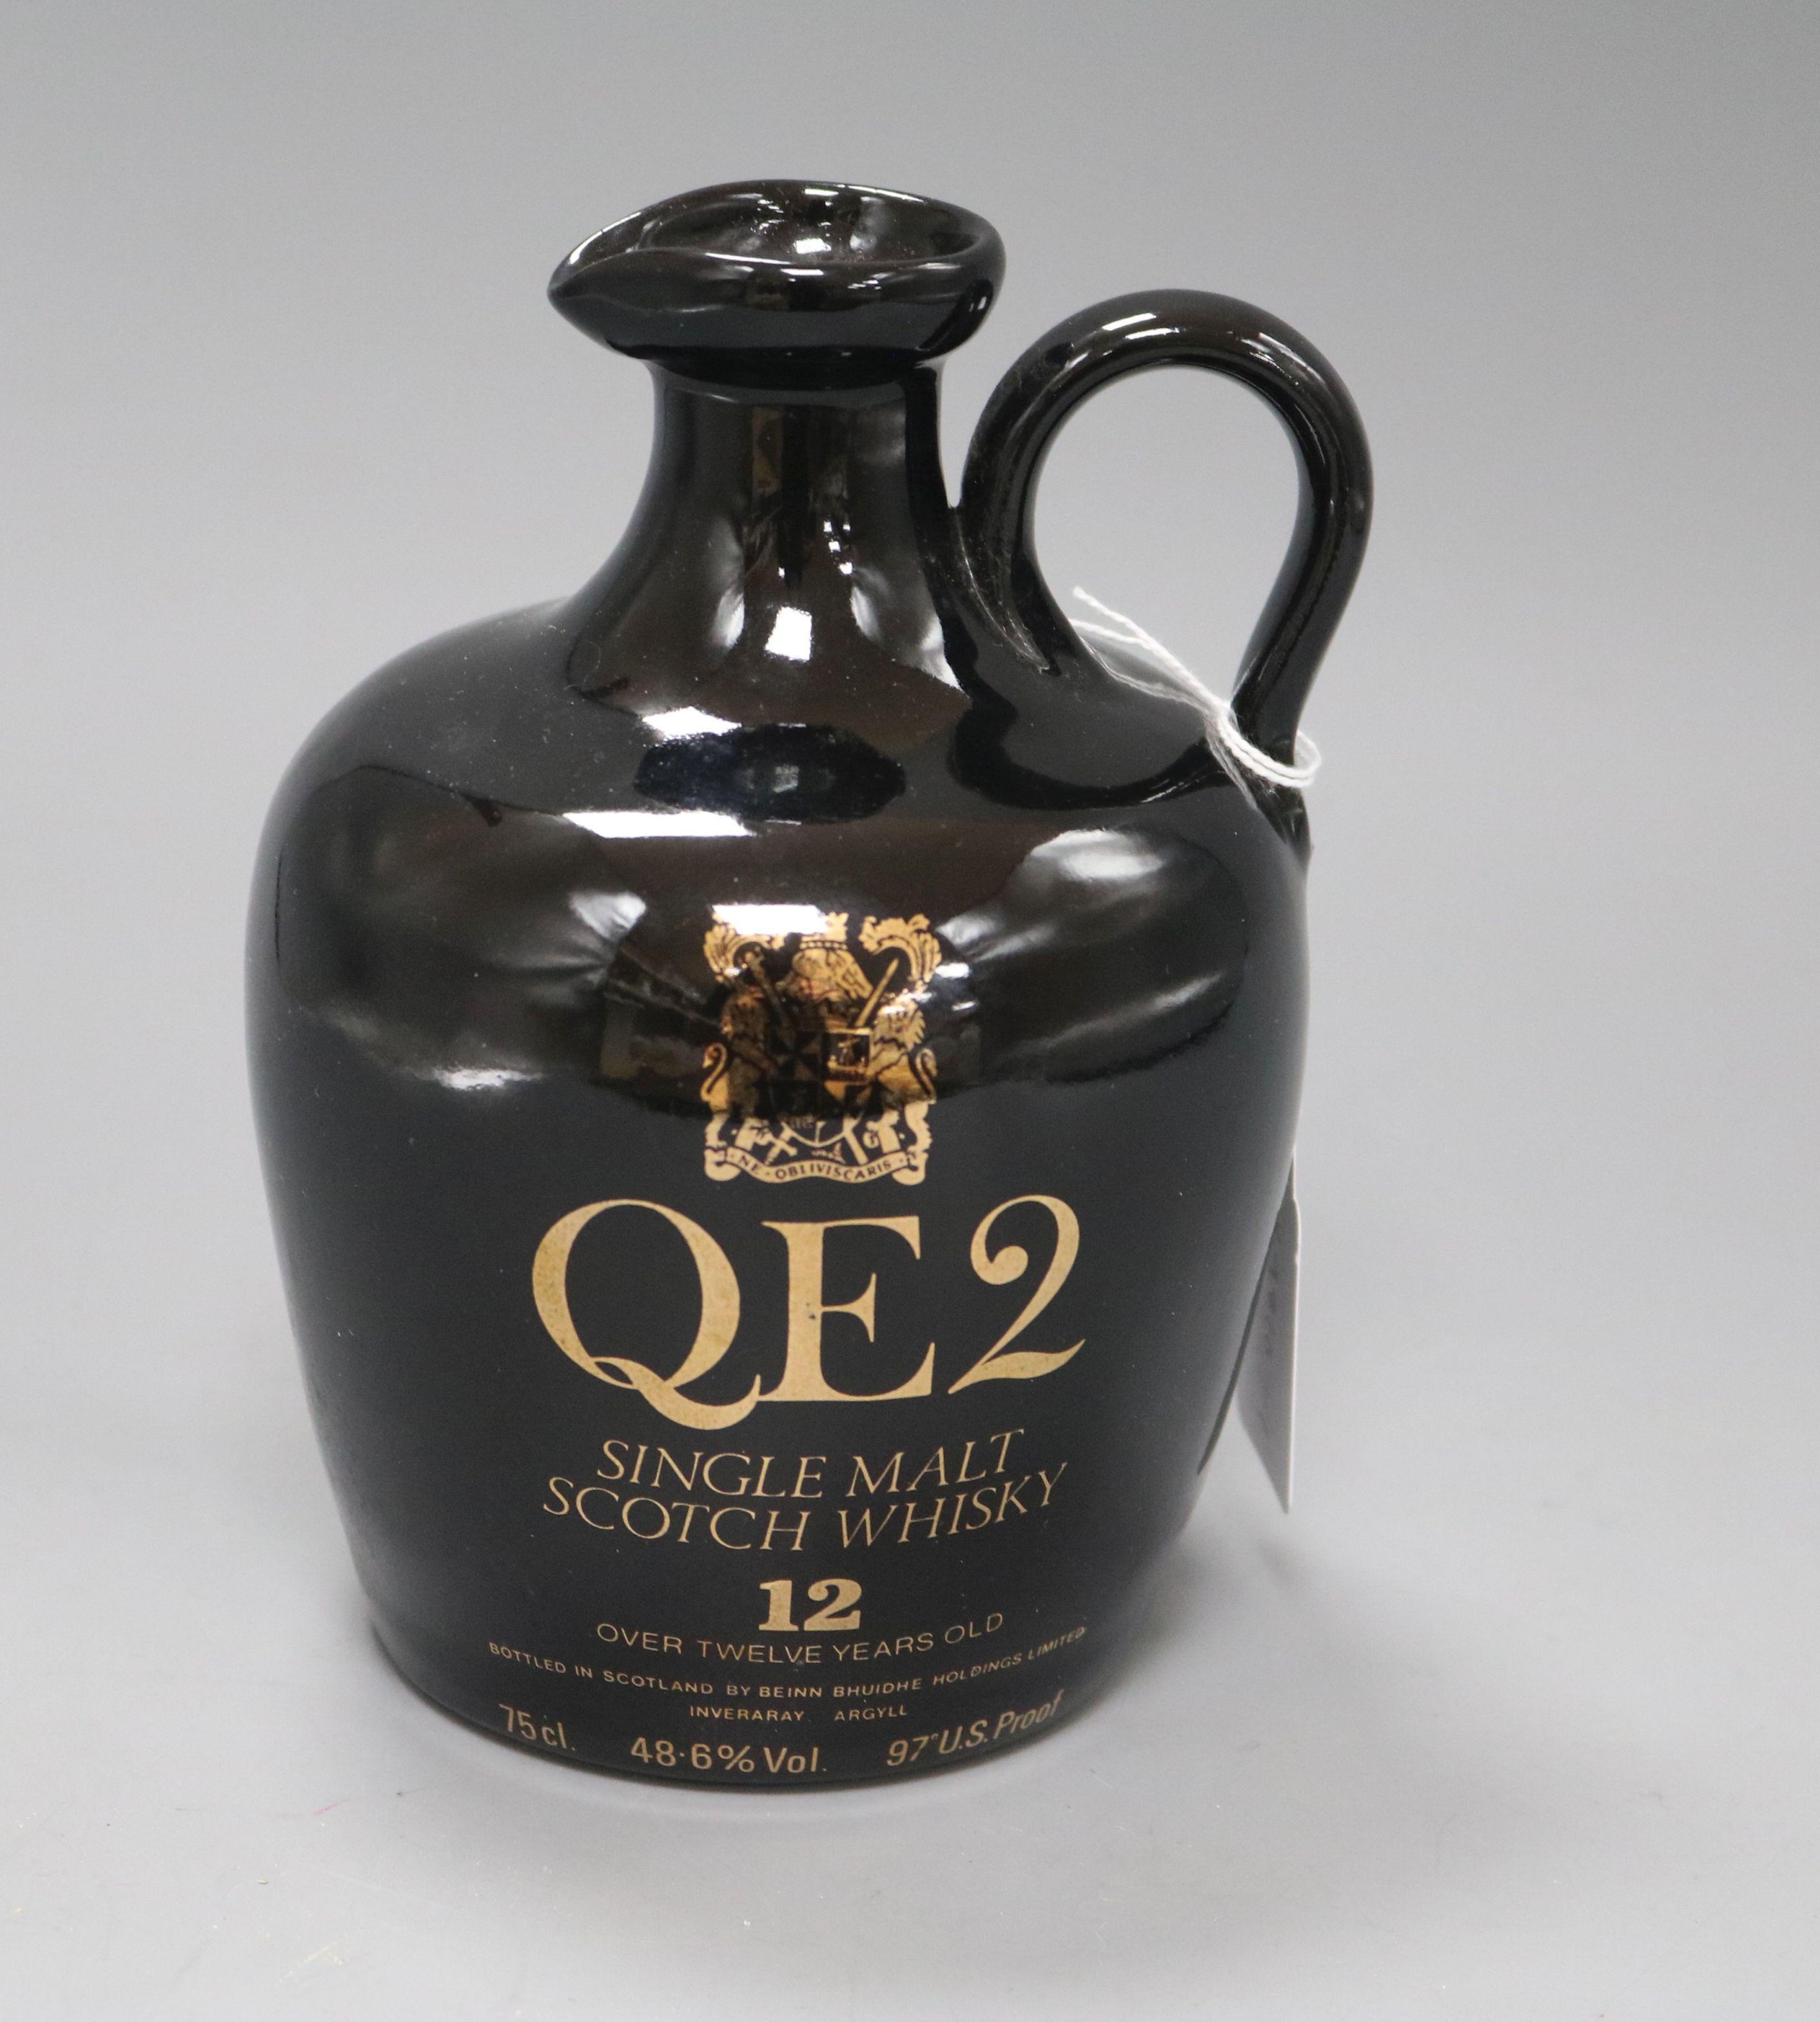 Lot 55 - A Queen Elizabeth II single malt scotch whisky 12yo, in presentation box